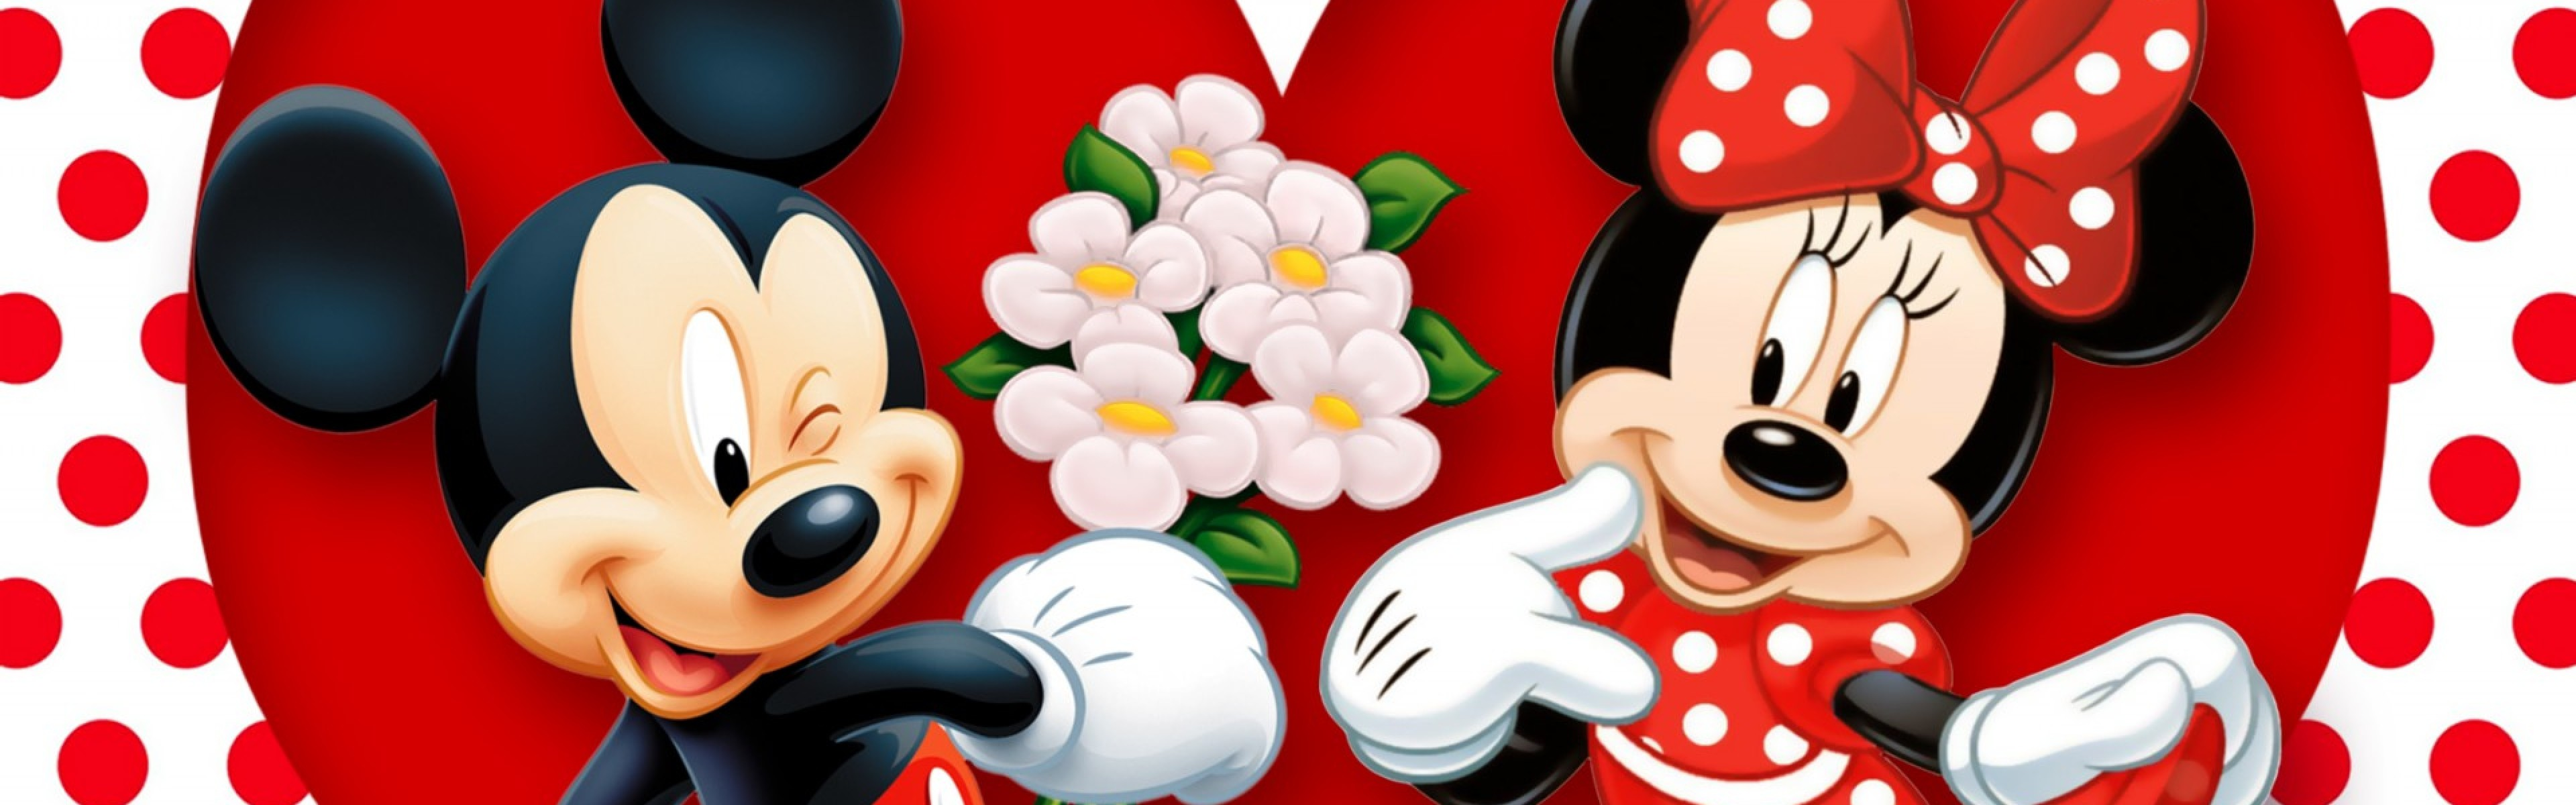 outstanding minnie wallpaper mickey - photo #23